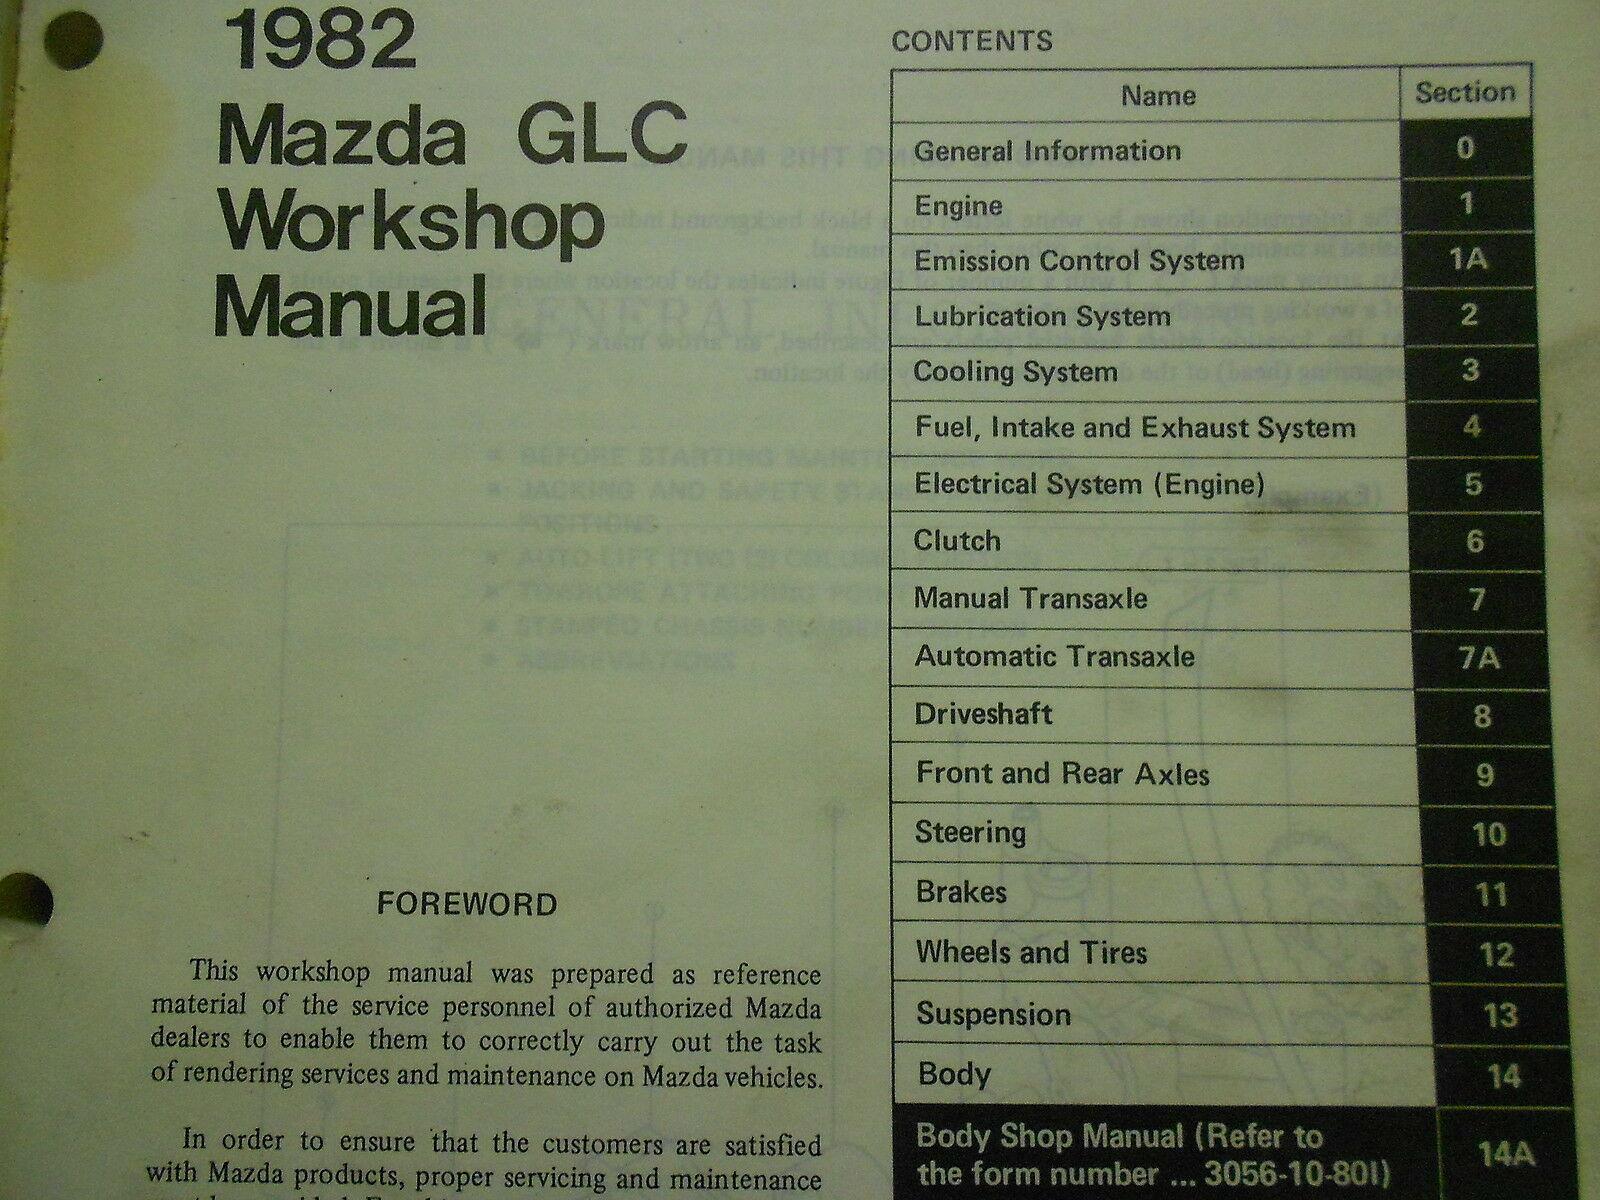 1982 Mazda Glc Service Reparatur Shop Manuell Fabrik Autohaus OEM Buch 82